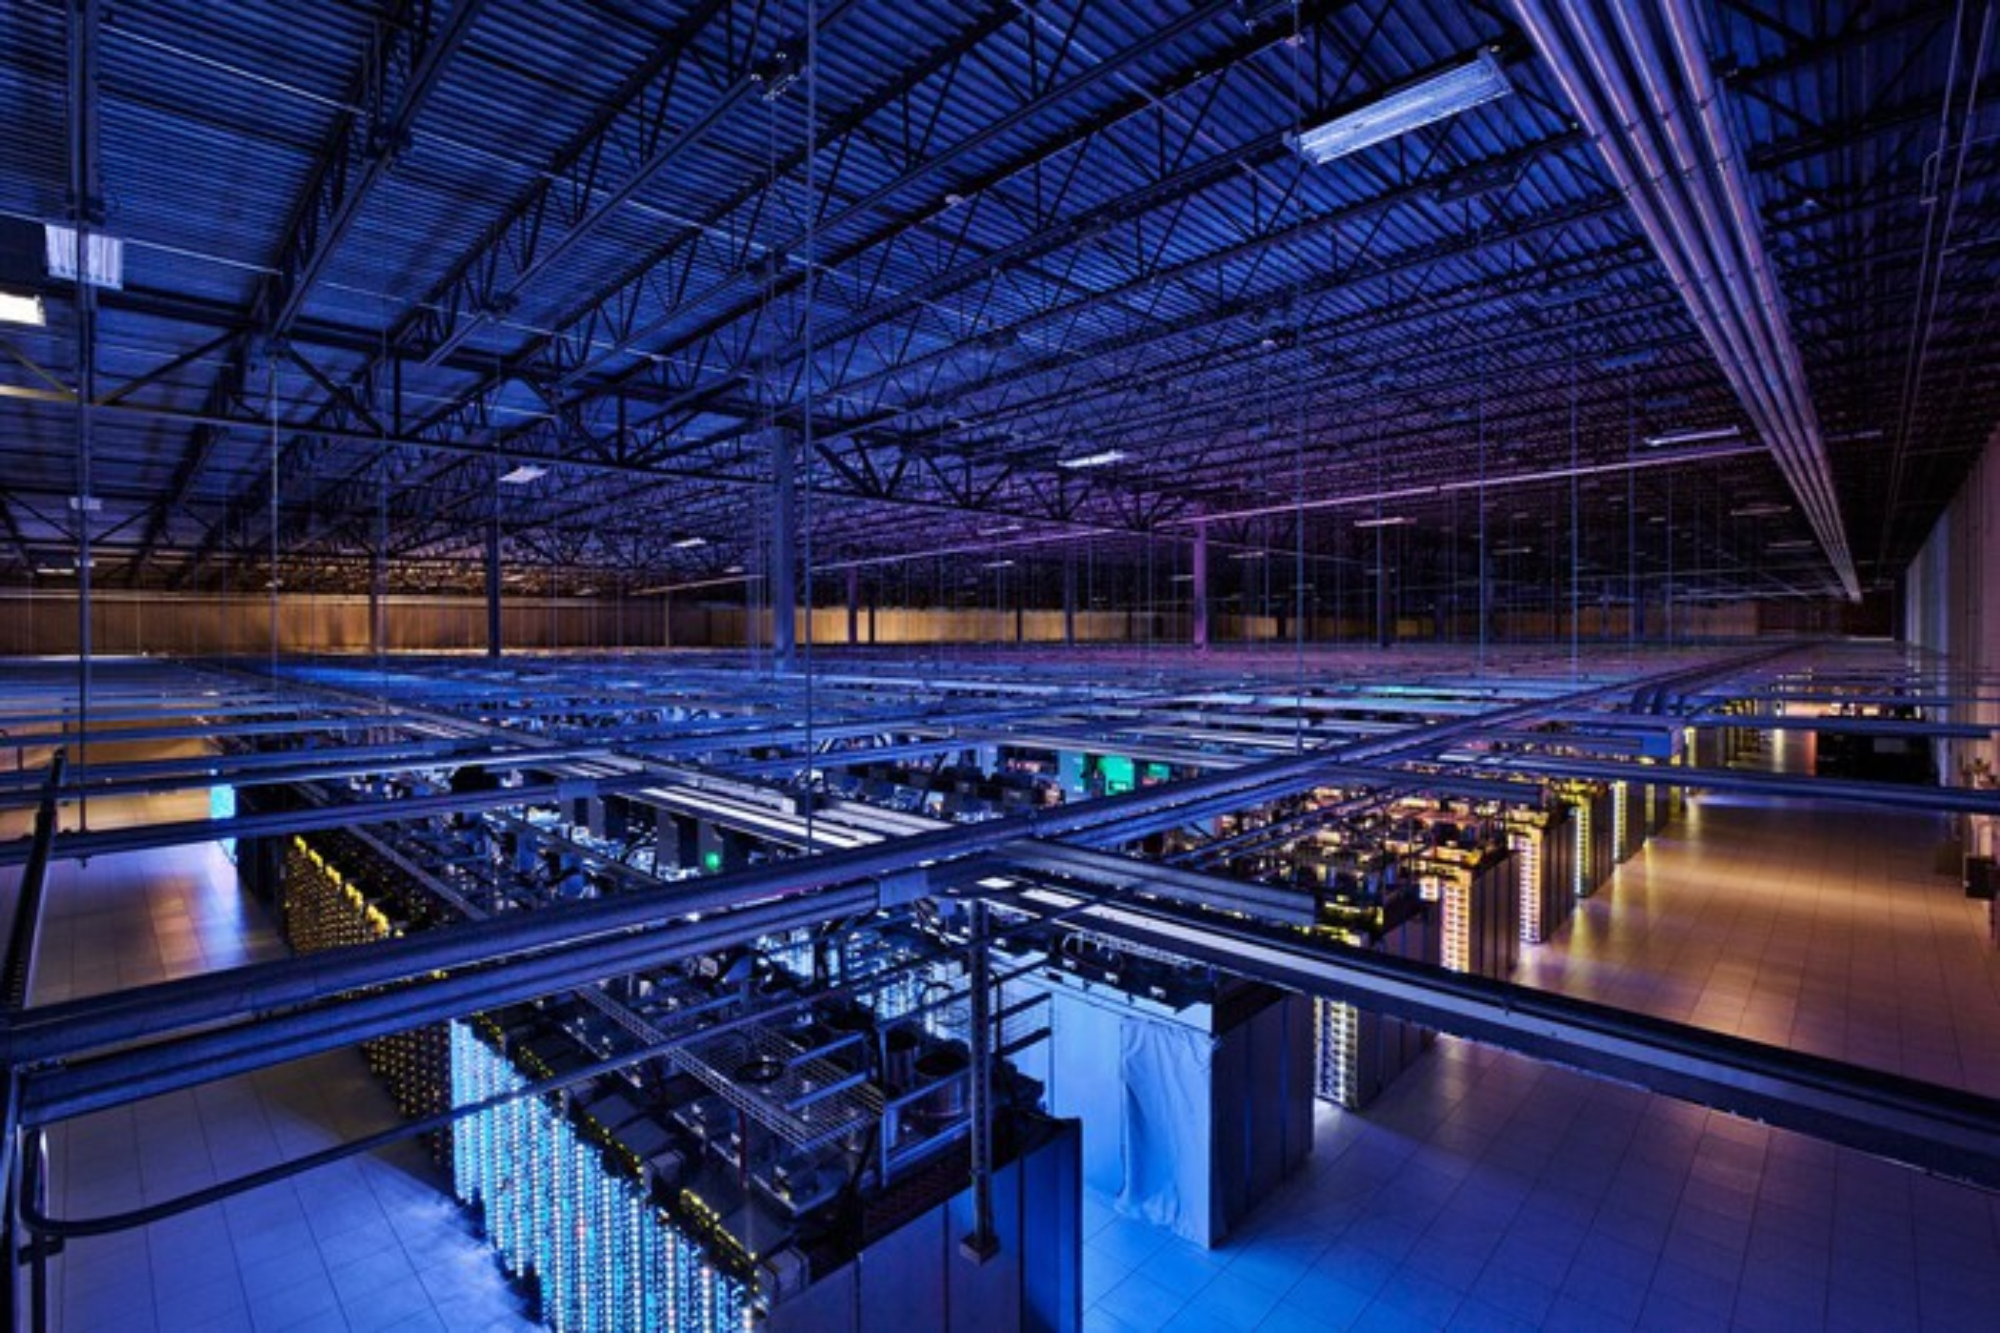 Google data center in Council Bluffs, Iowa